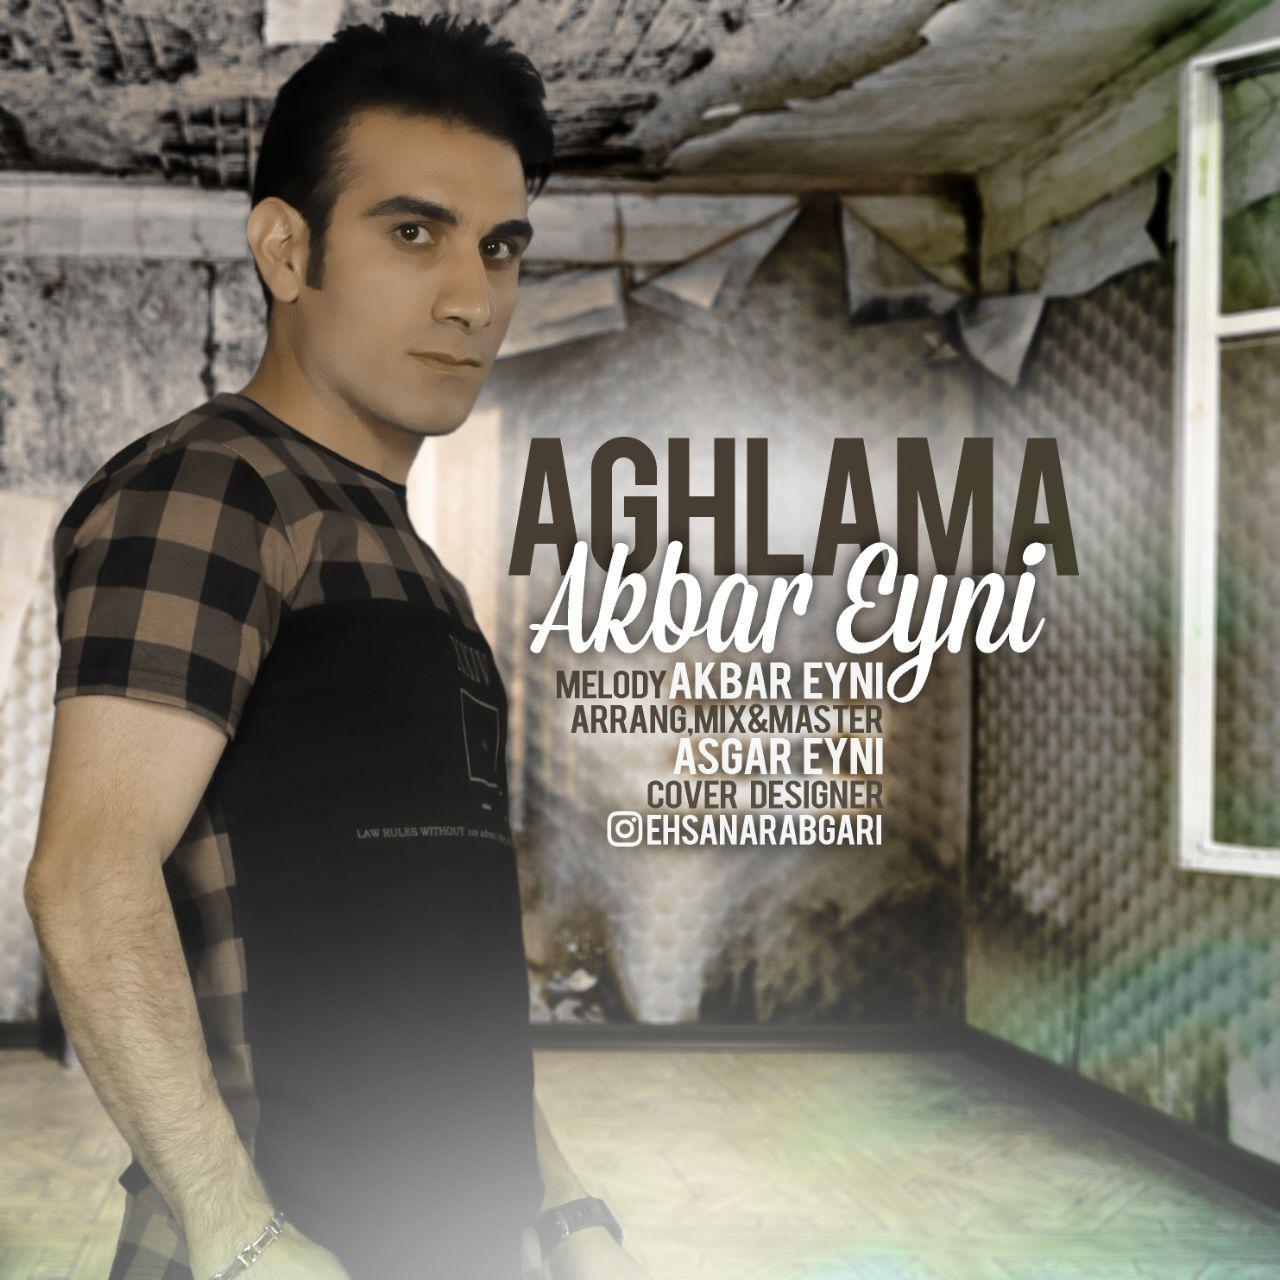 http://s9.picofile.com/file/8301016350/060Akbar_Eyni_Aghlama.jpg